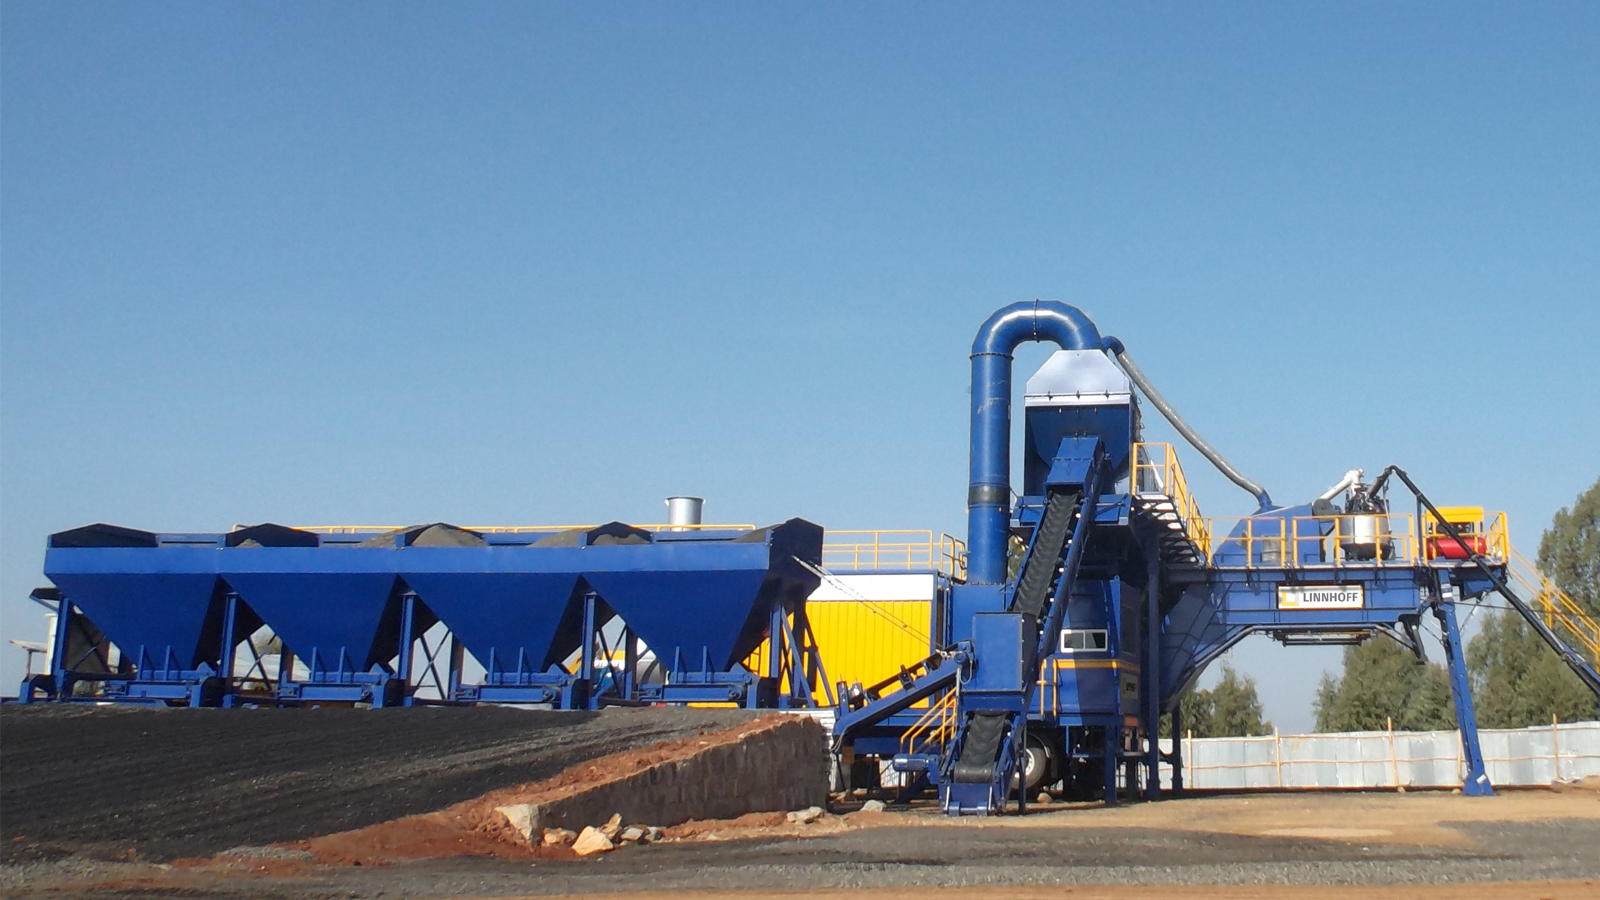 Linnhoff TSD 1500 MobileMix asphalt plants, a popular choice for road contractors in Ethiopia